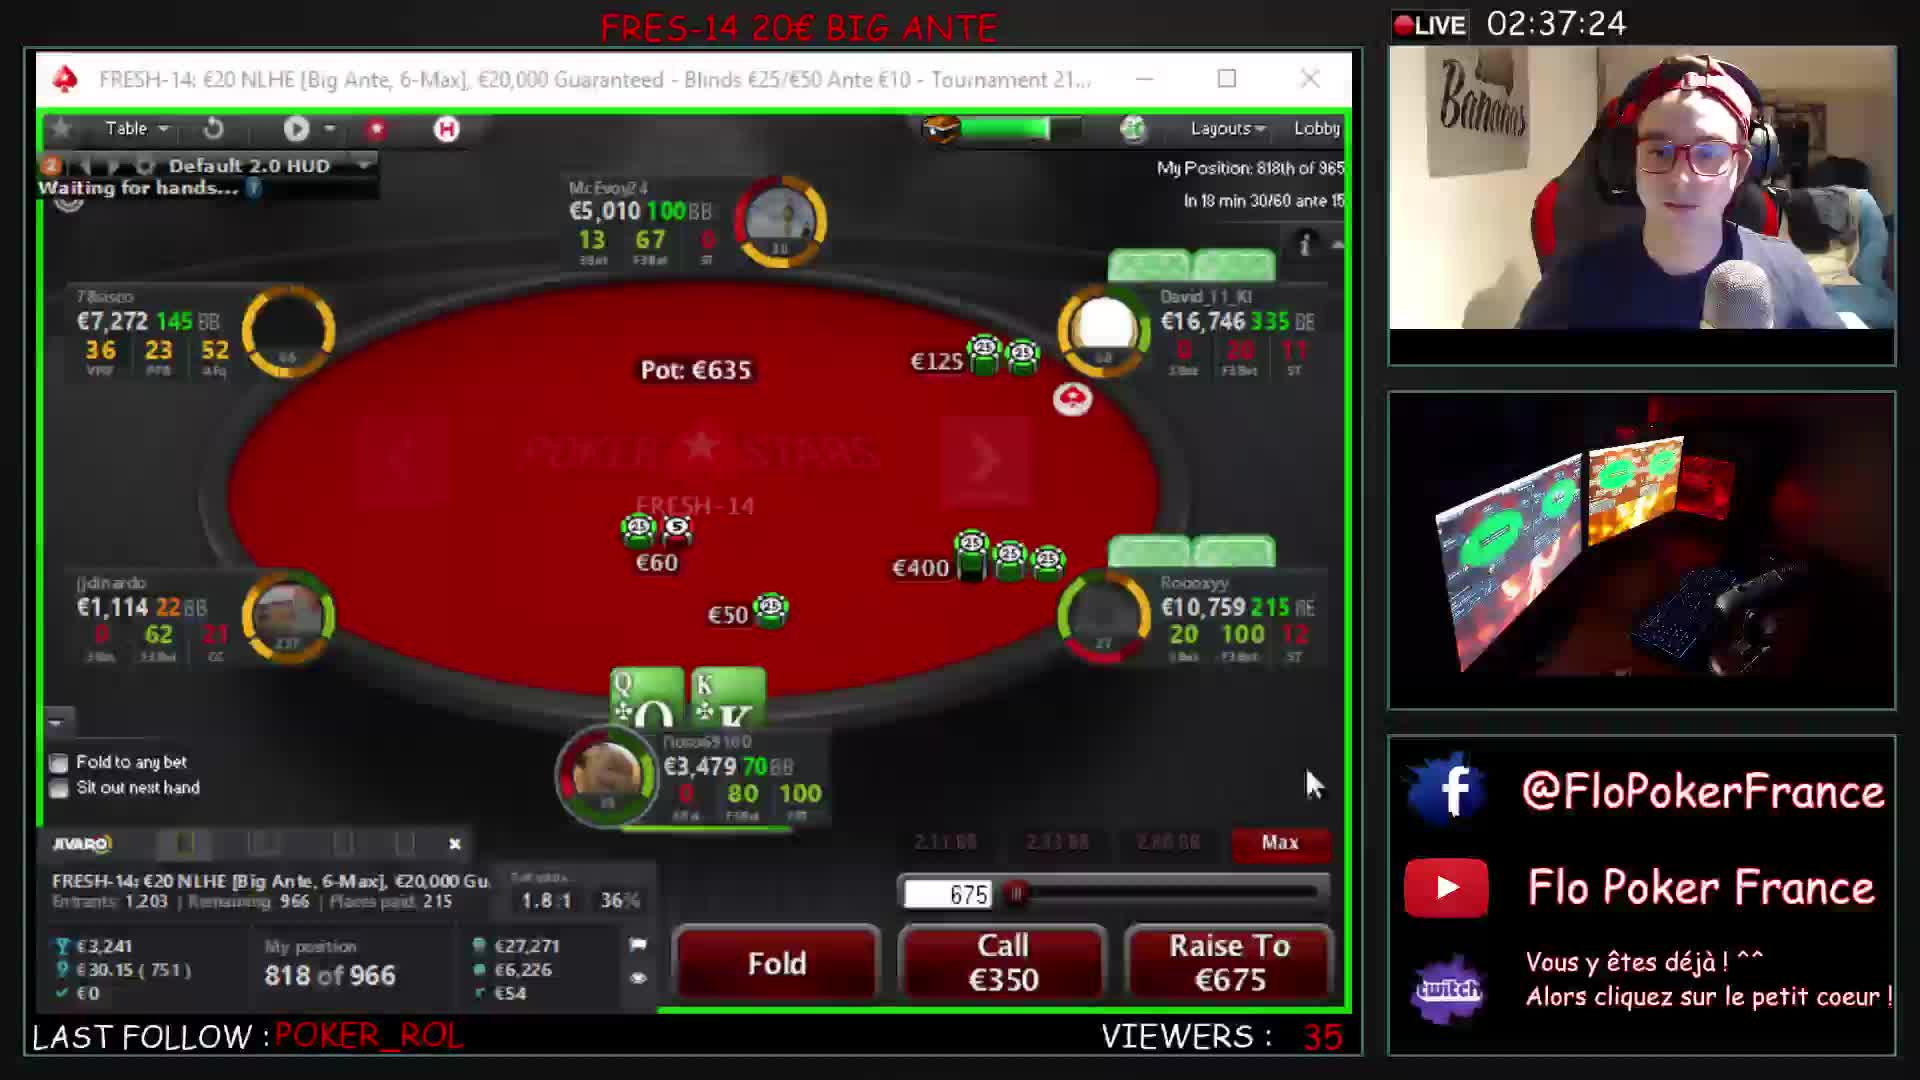 Big game poker france slot car illinois